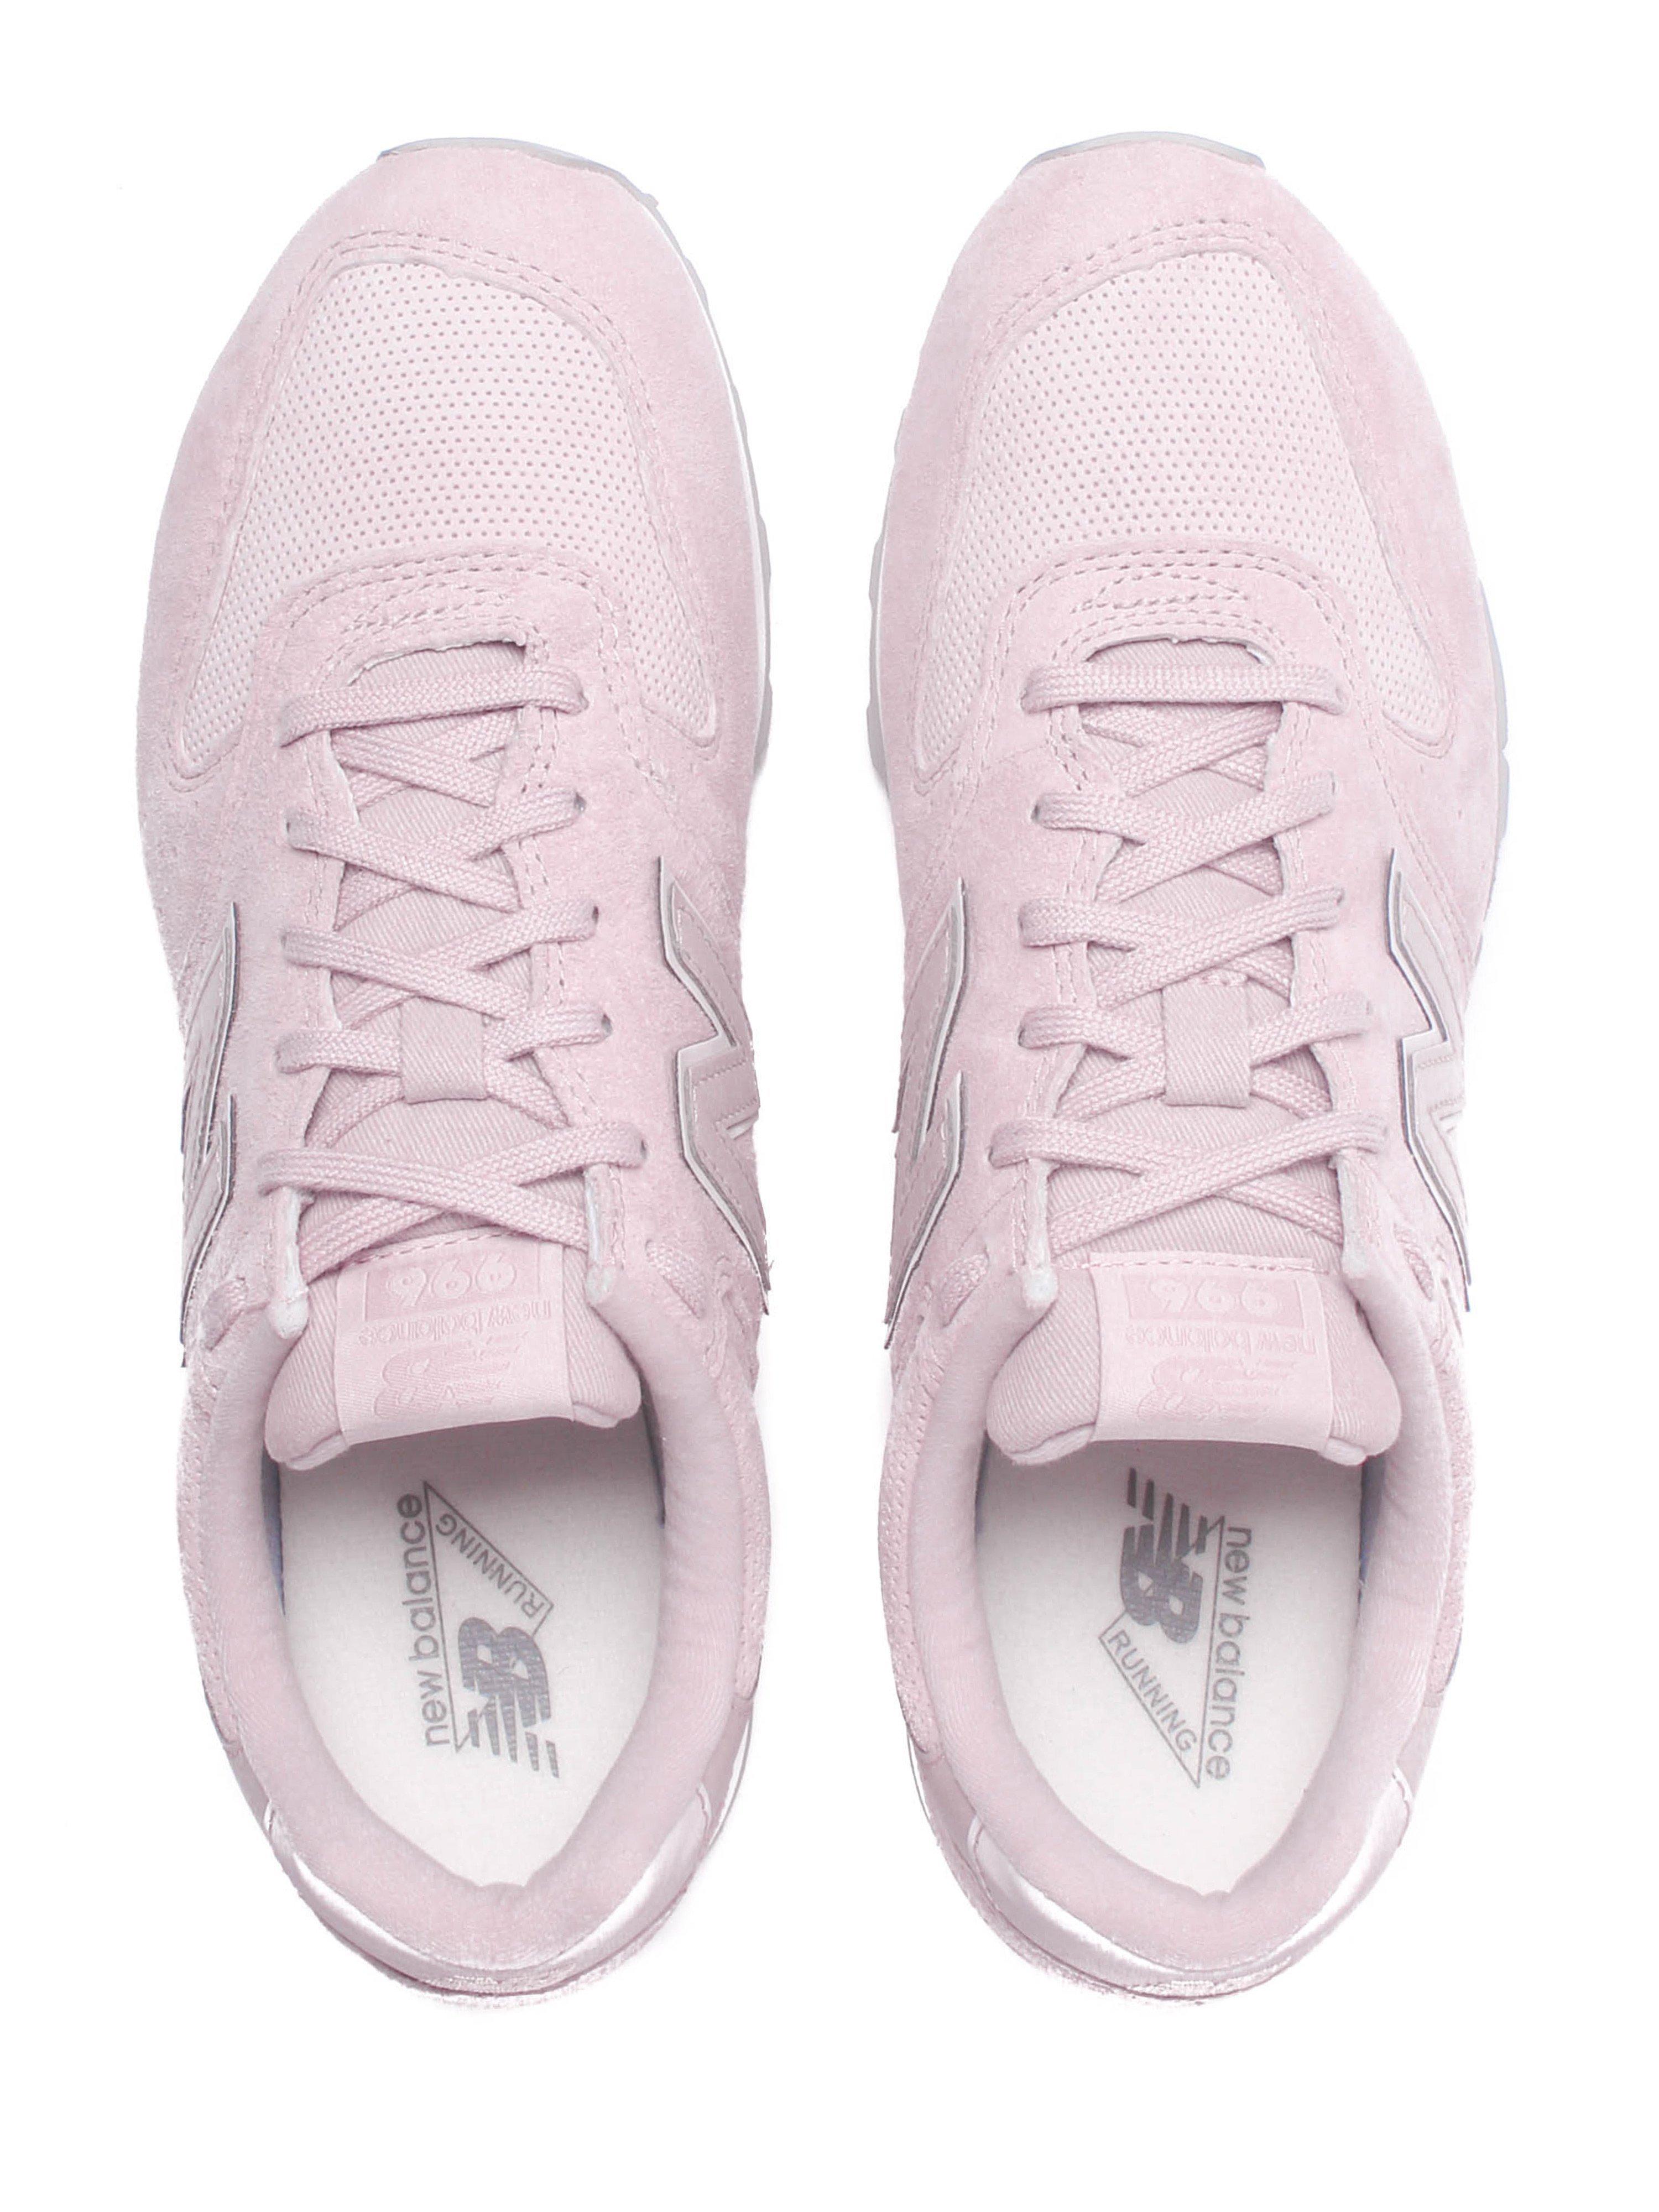 New Balance Women's 996 Trainer's - Pink Suede